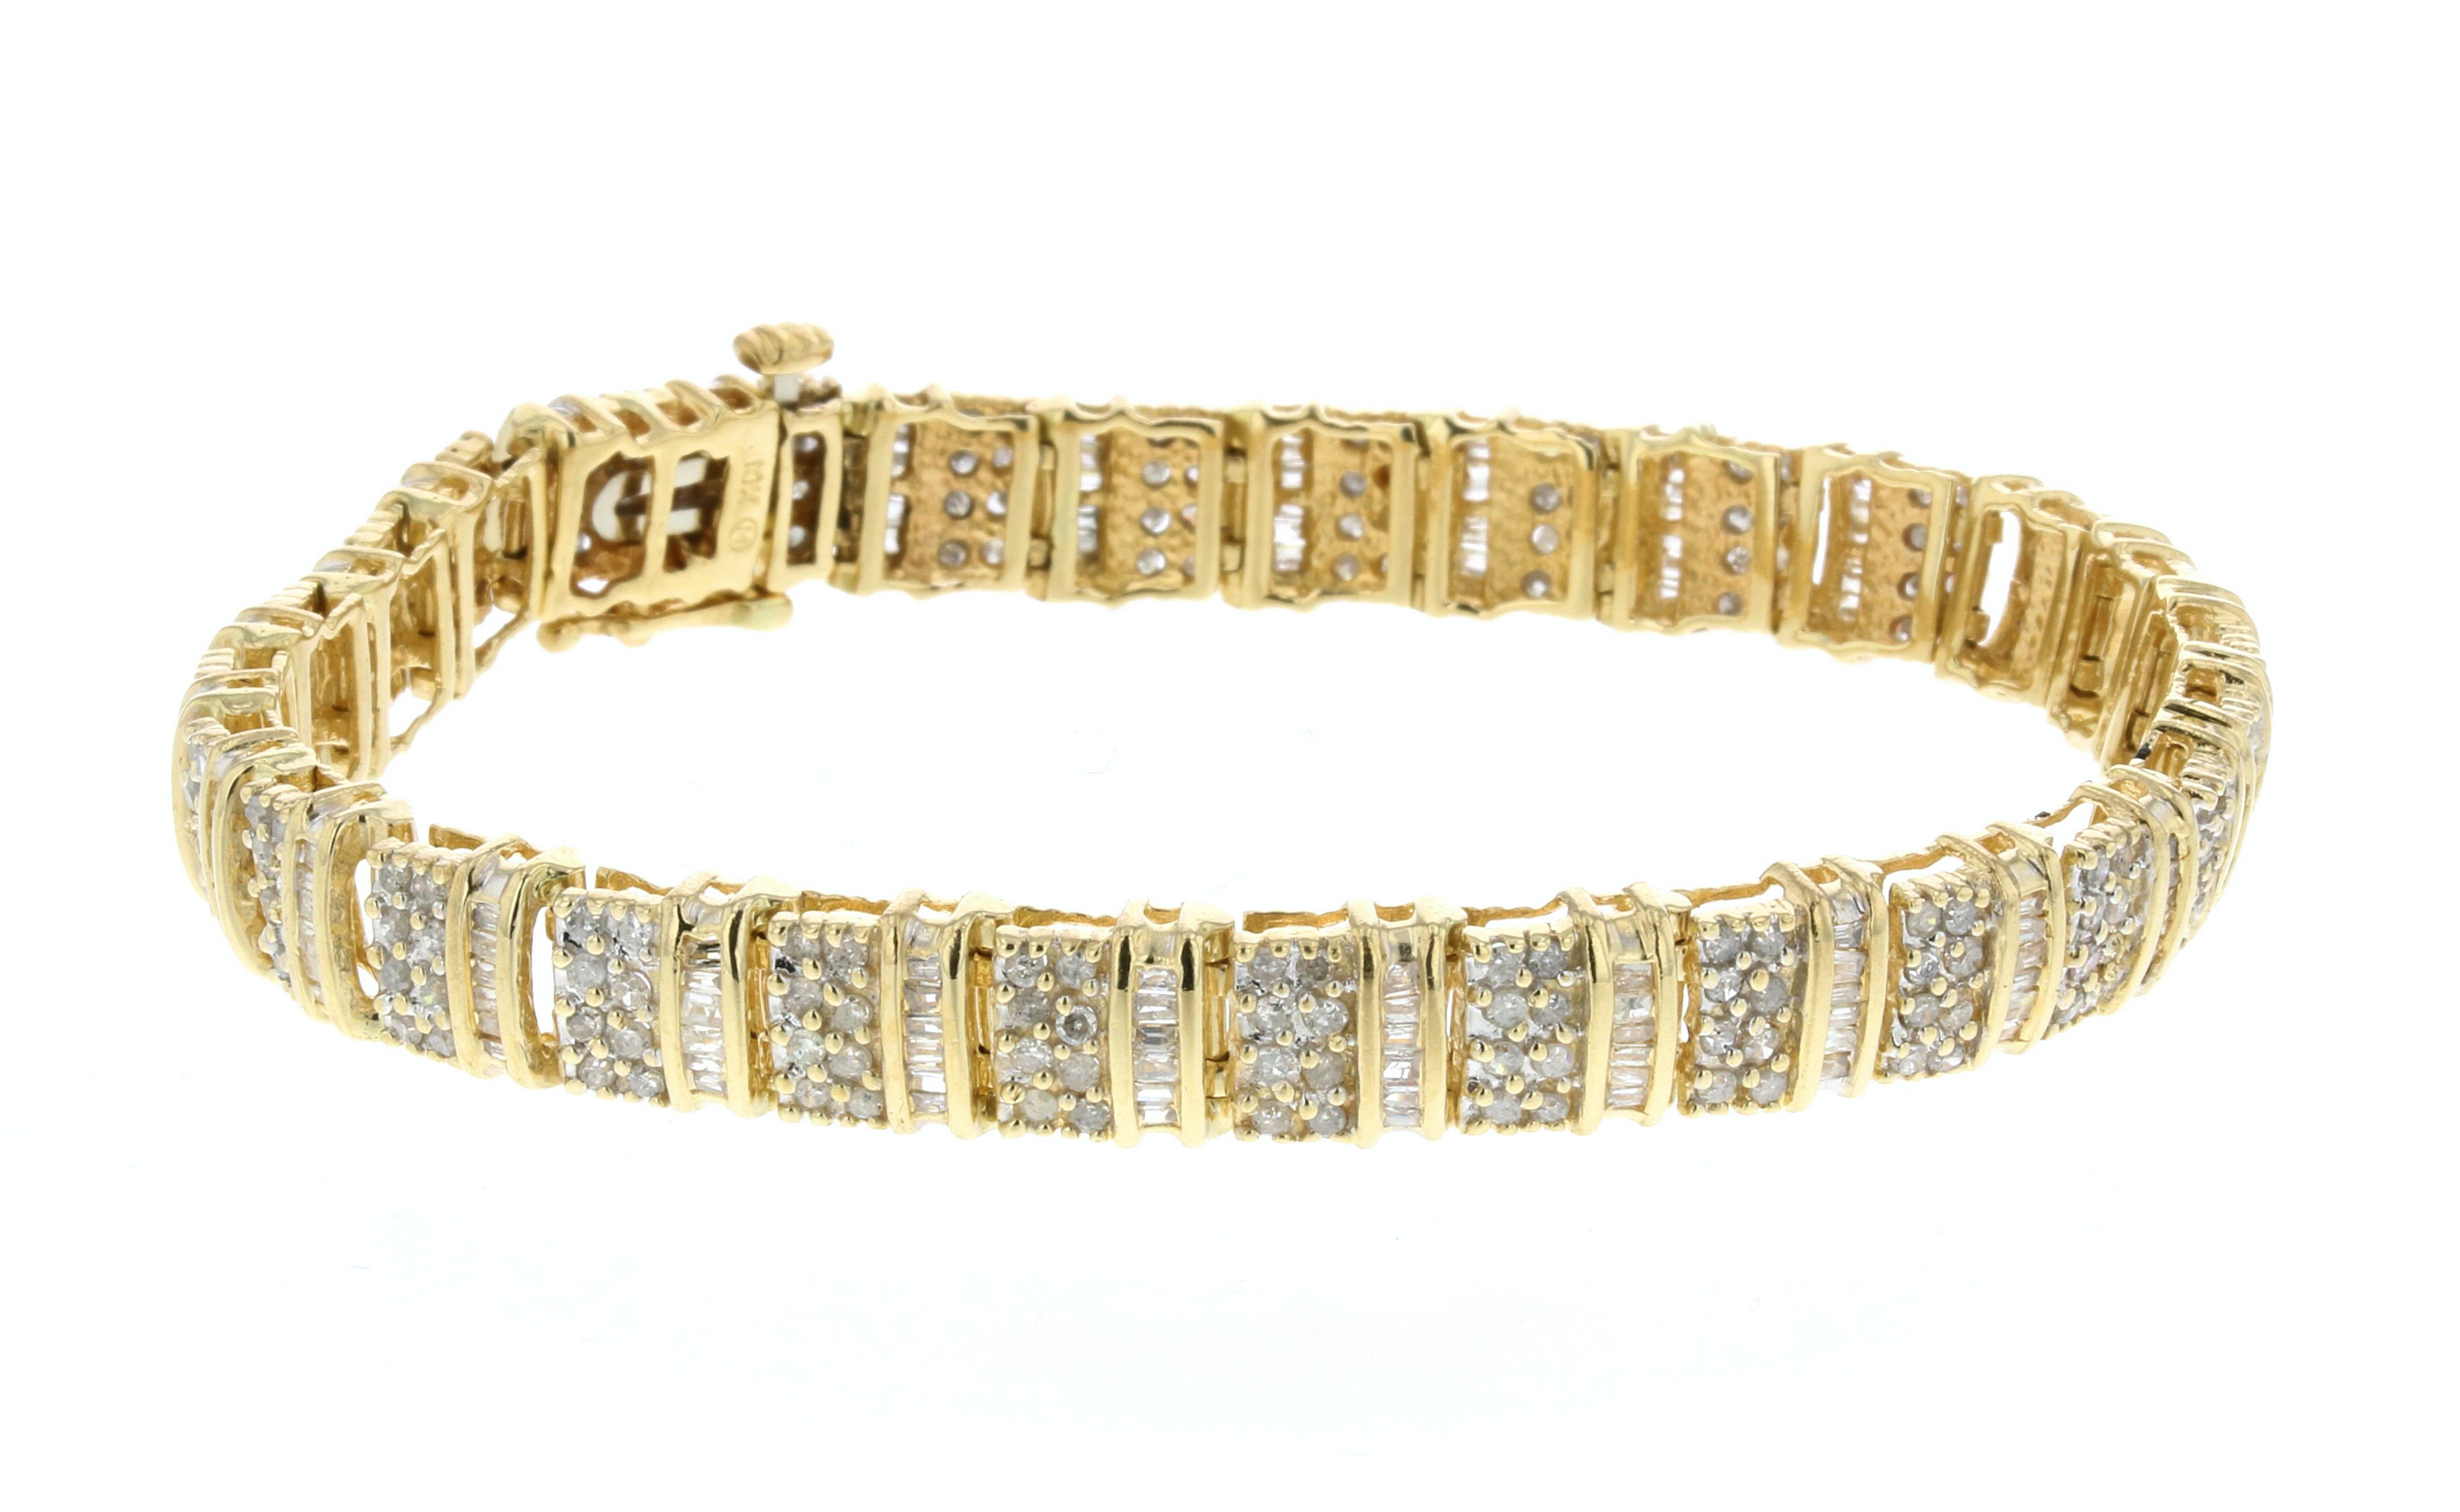 10K Yellow Gold 4.85 CTW Diamond Bracelet